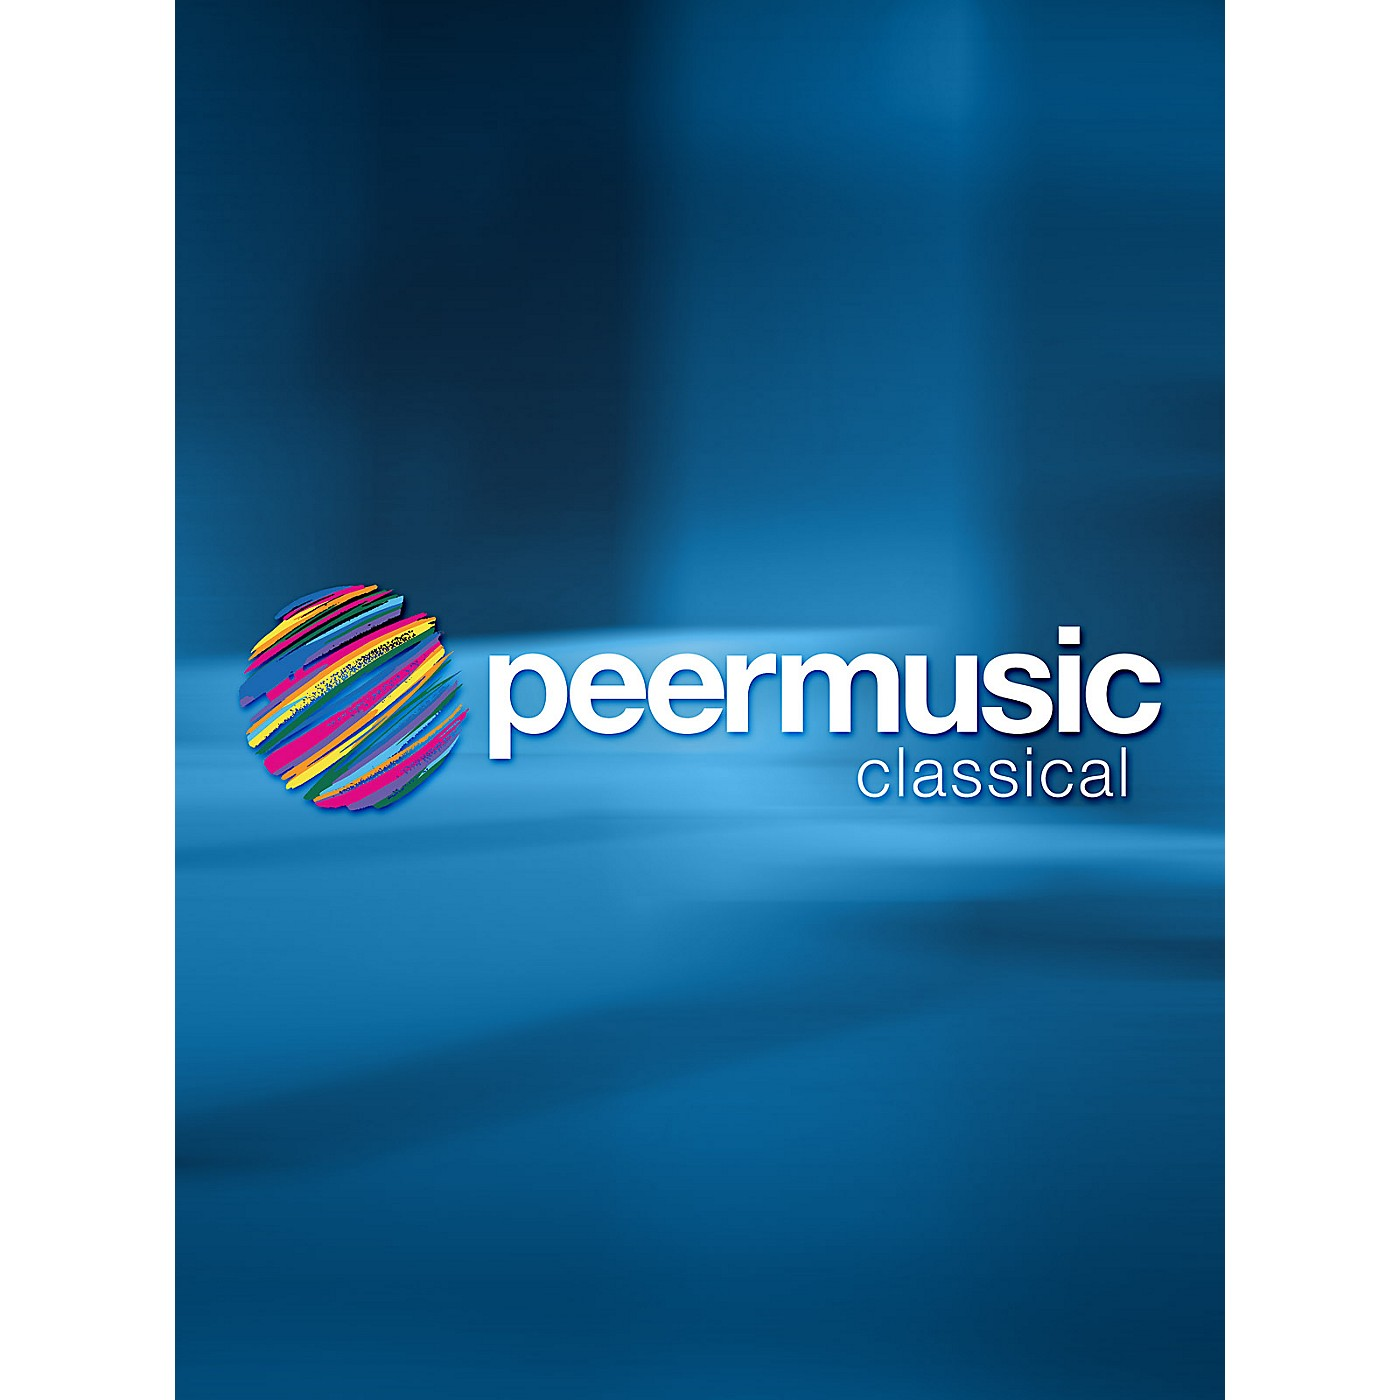 Peer Music Saxophone Quartet (Score and Parts) Peermusic Classical Series Book  by Harold Shapero thumbnail